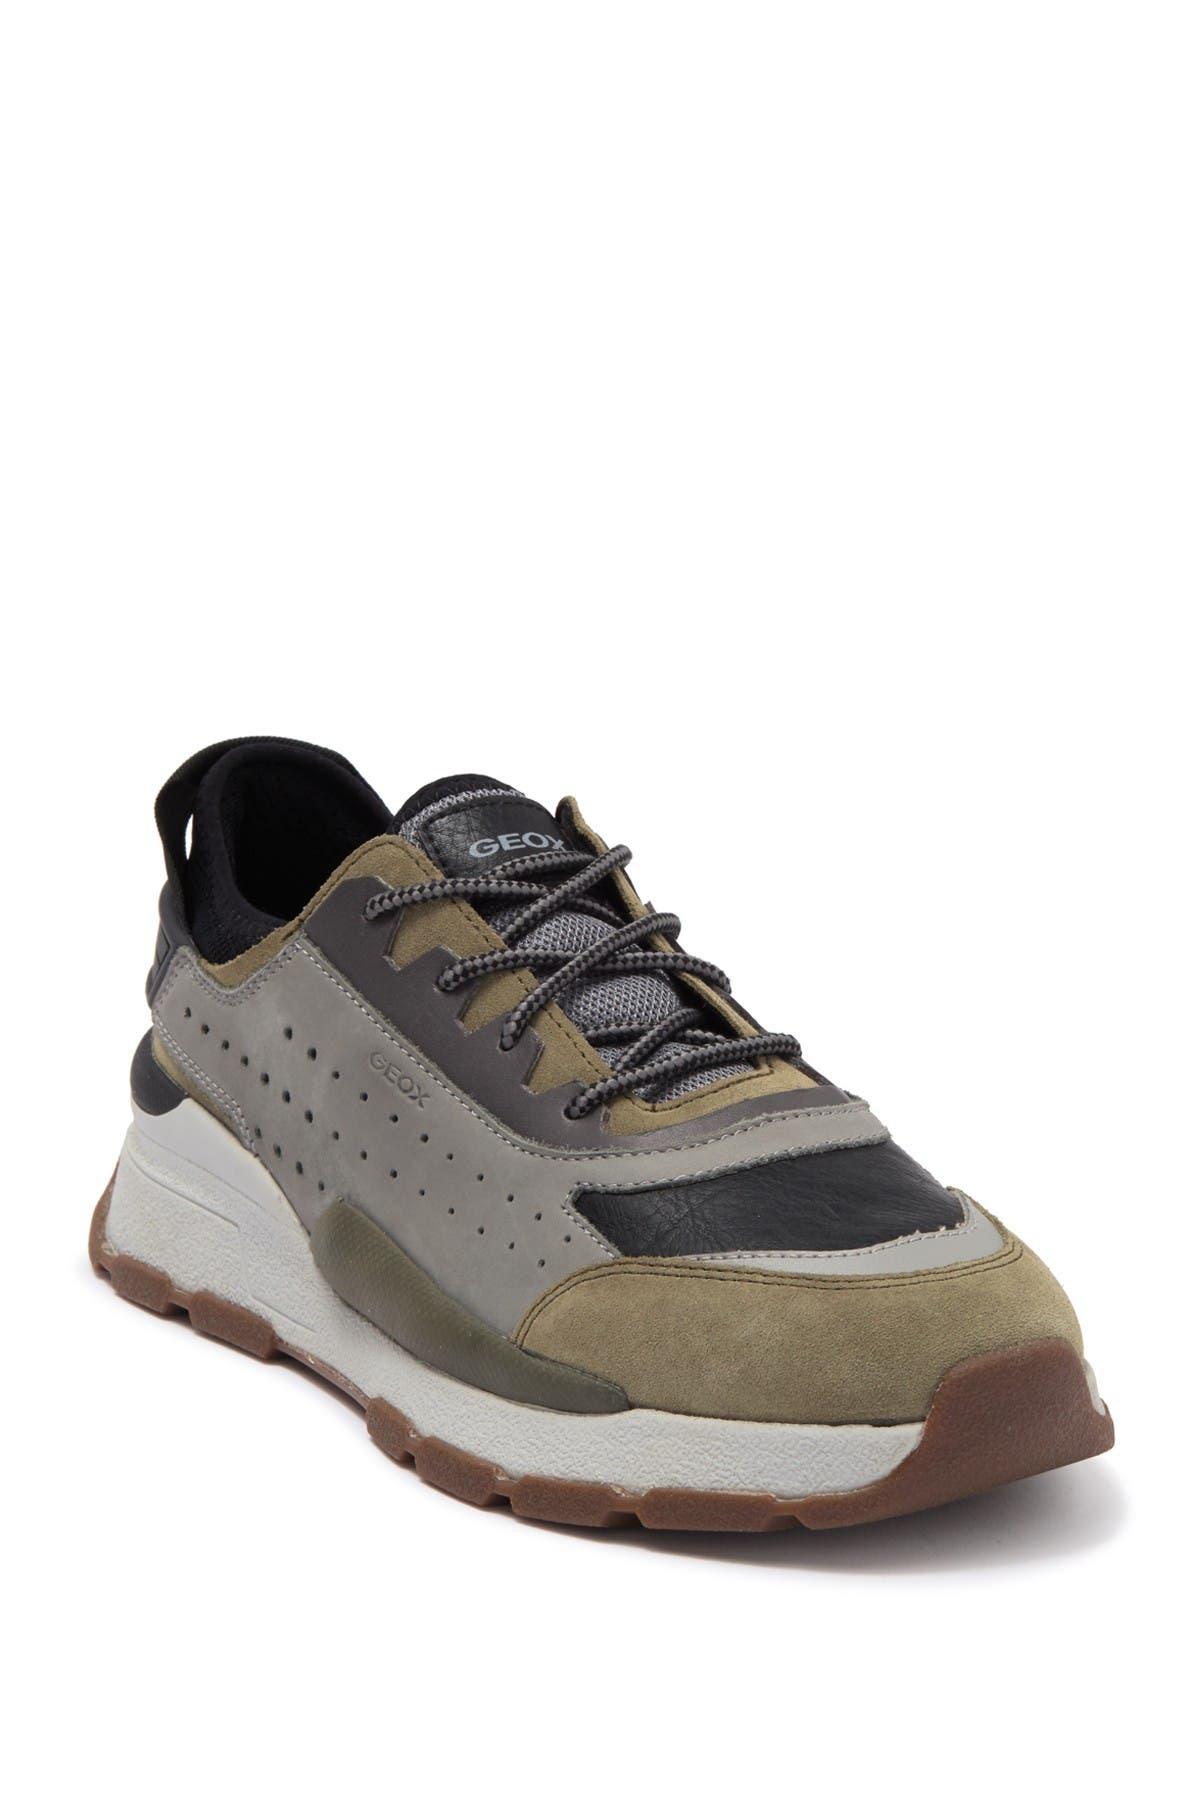 Image of GEOX Regale Suede Sneaker